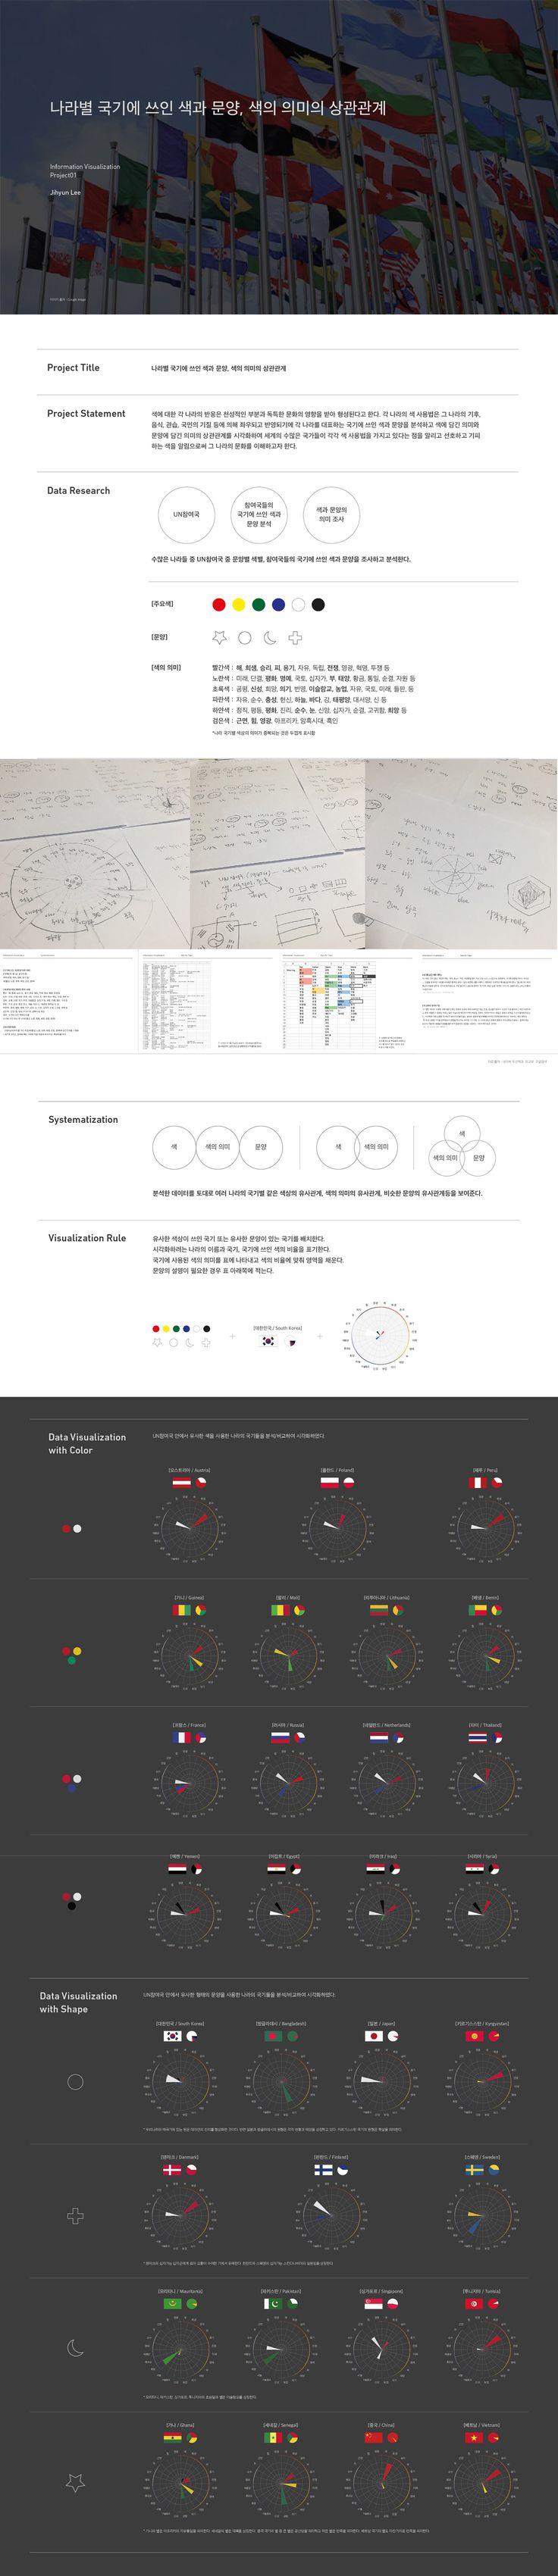 Lee Ji Hyun | Correlation between color, pattern, and color used in national flags | Information Visualization 2016│ Major in Digital Media Design │#hicoda │hicoda.hongik.ac.kr